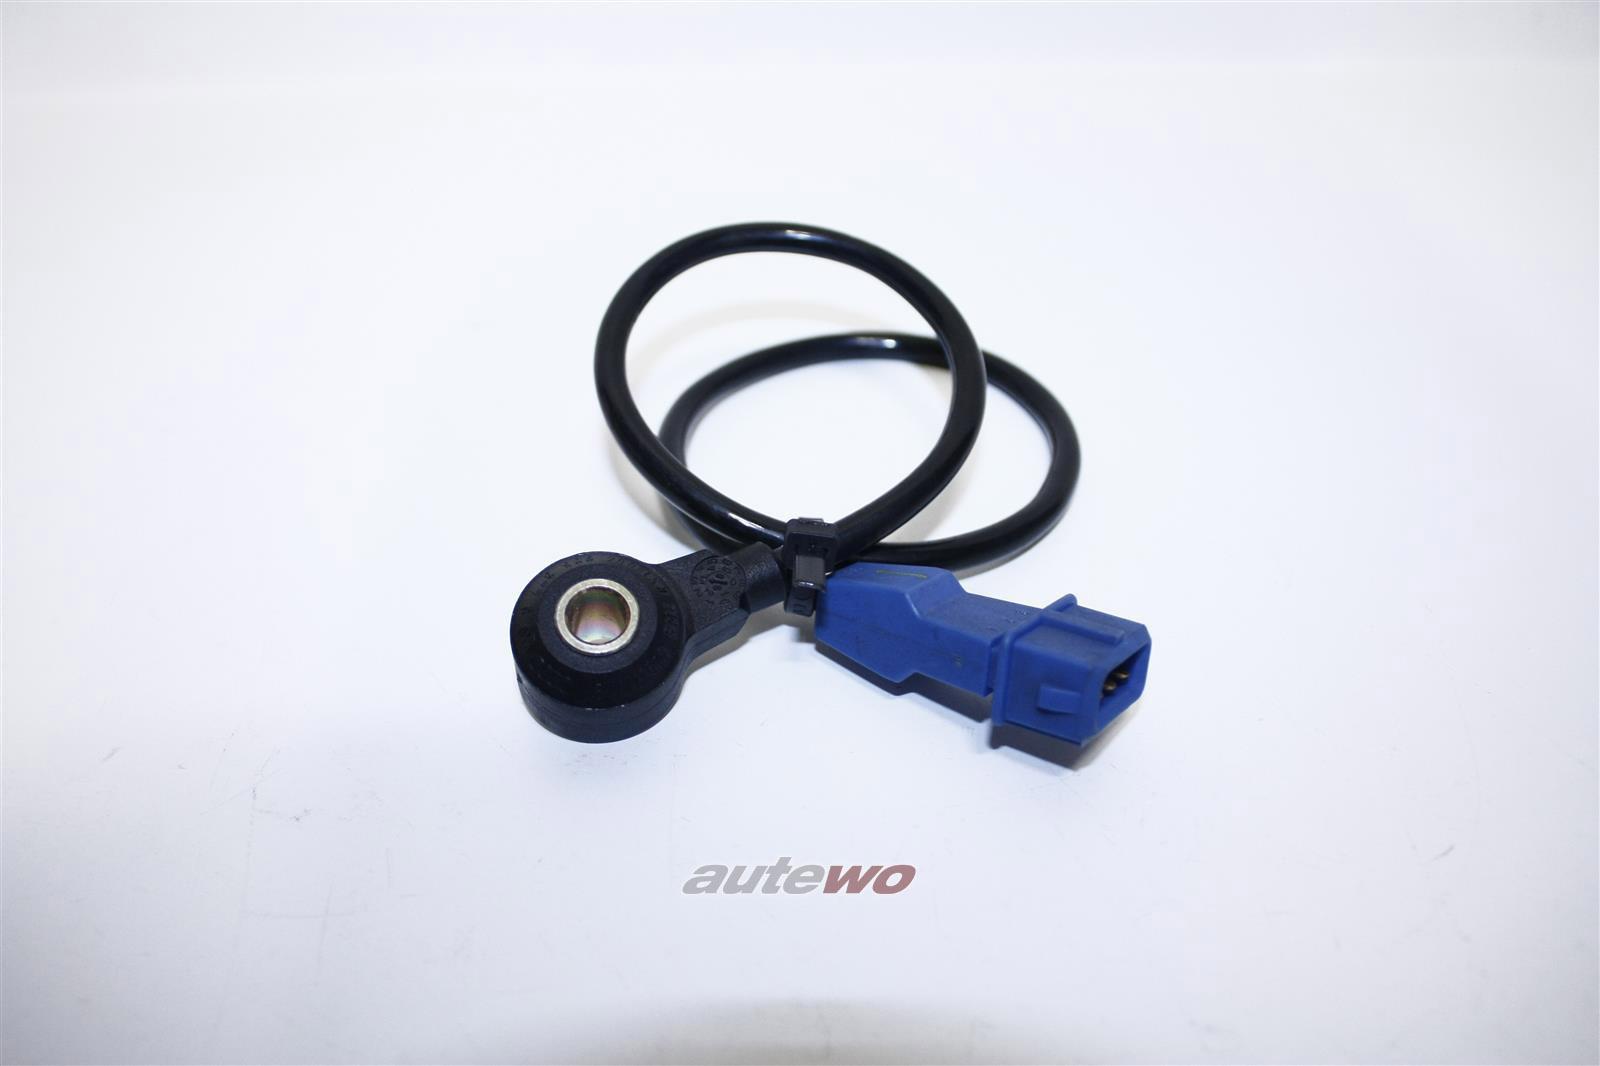 054905377G NEU Audi 80 B4/100 44/C4/A4 B5/A6 4B/A8 D2/RS2/Urquattro Klopfsensor